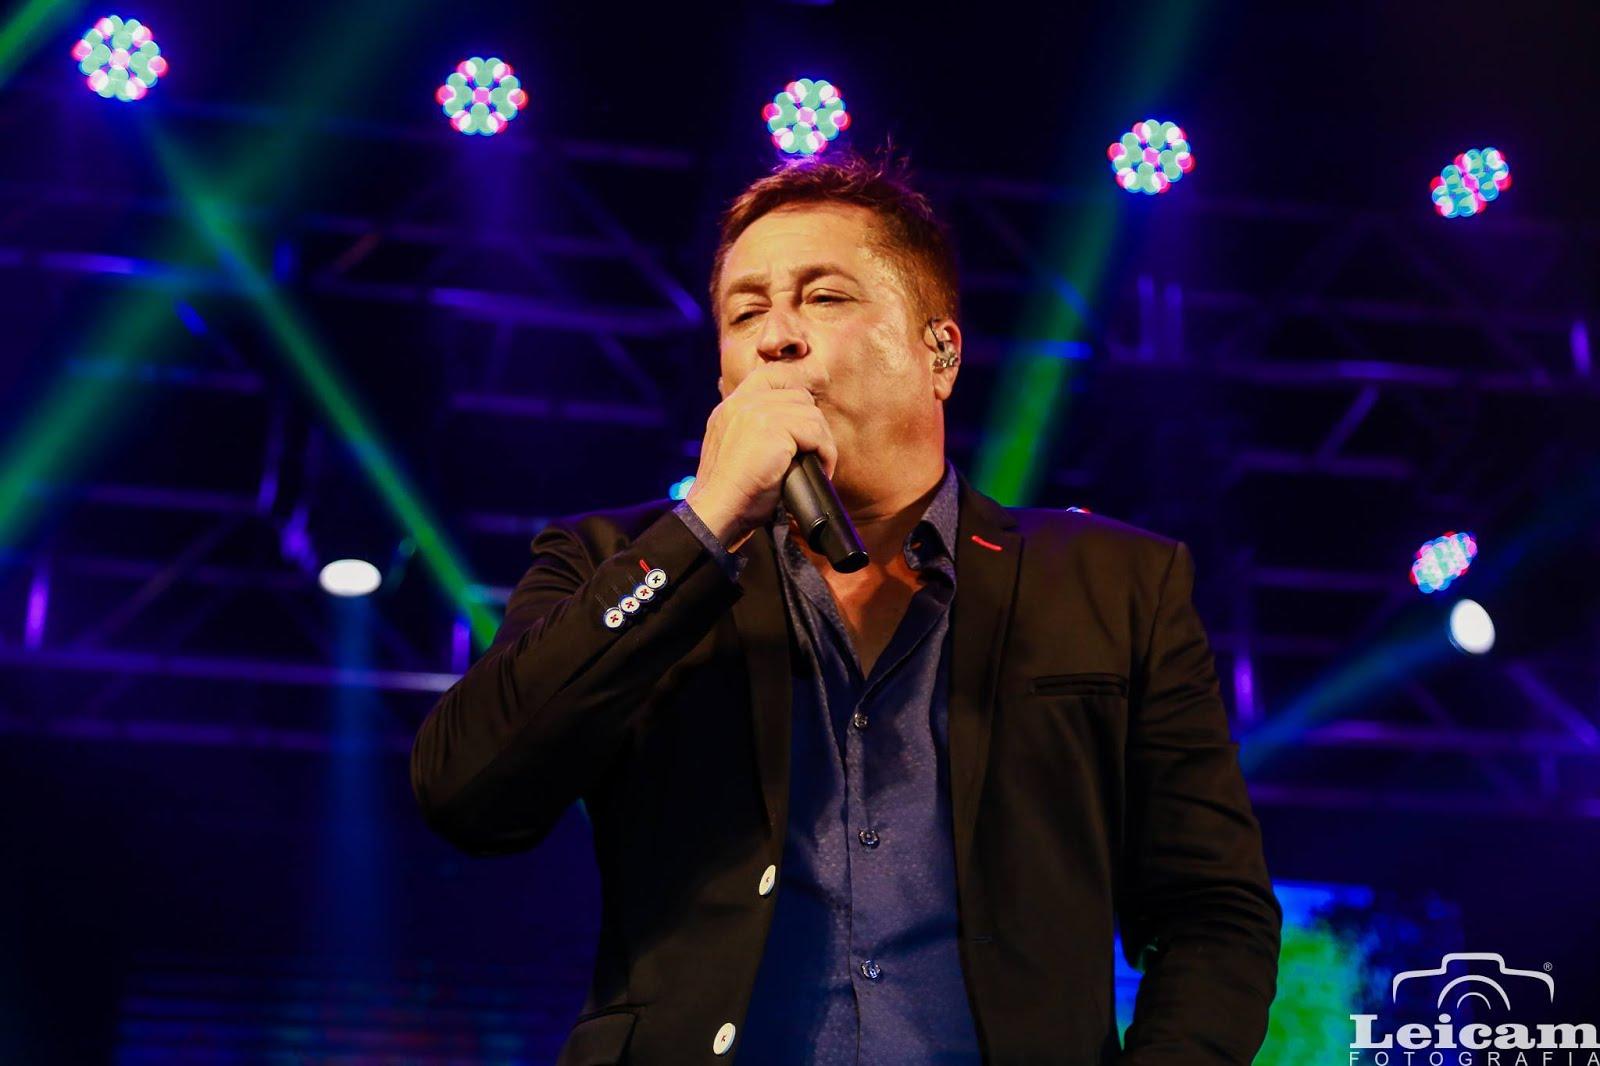 Turnê Canto Bebo E Choro🍷🍷 Leonardo em  ITAJUBÁ/MG 10/11/2018